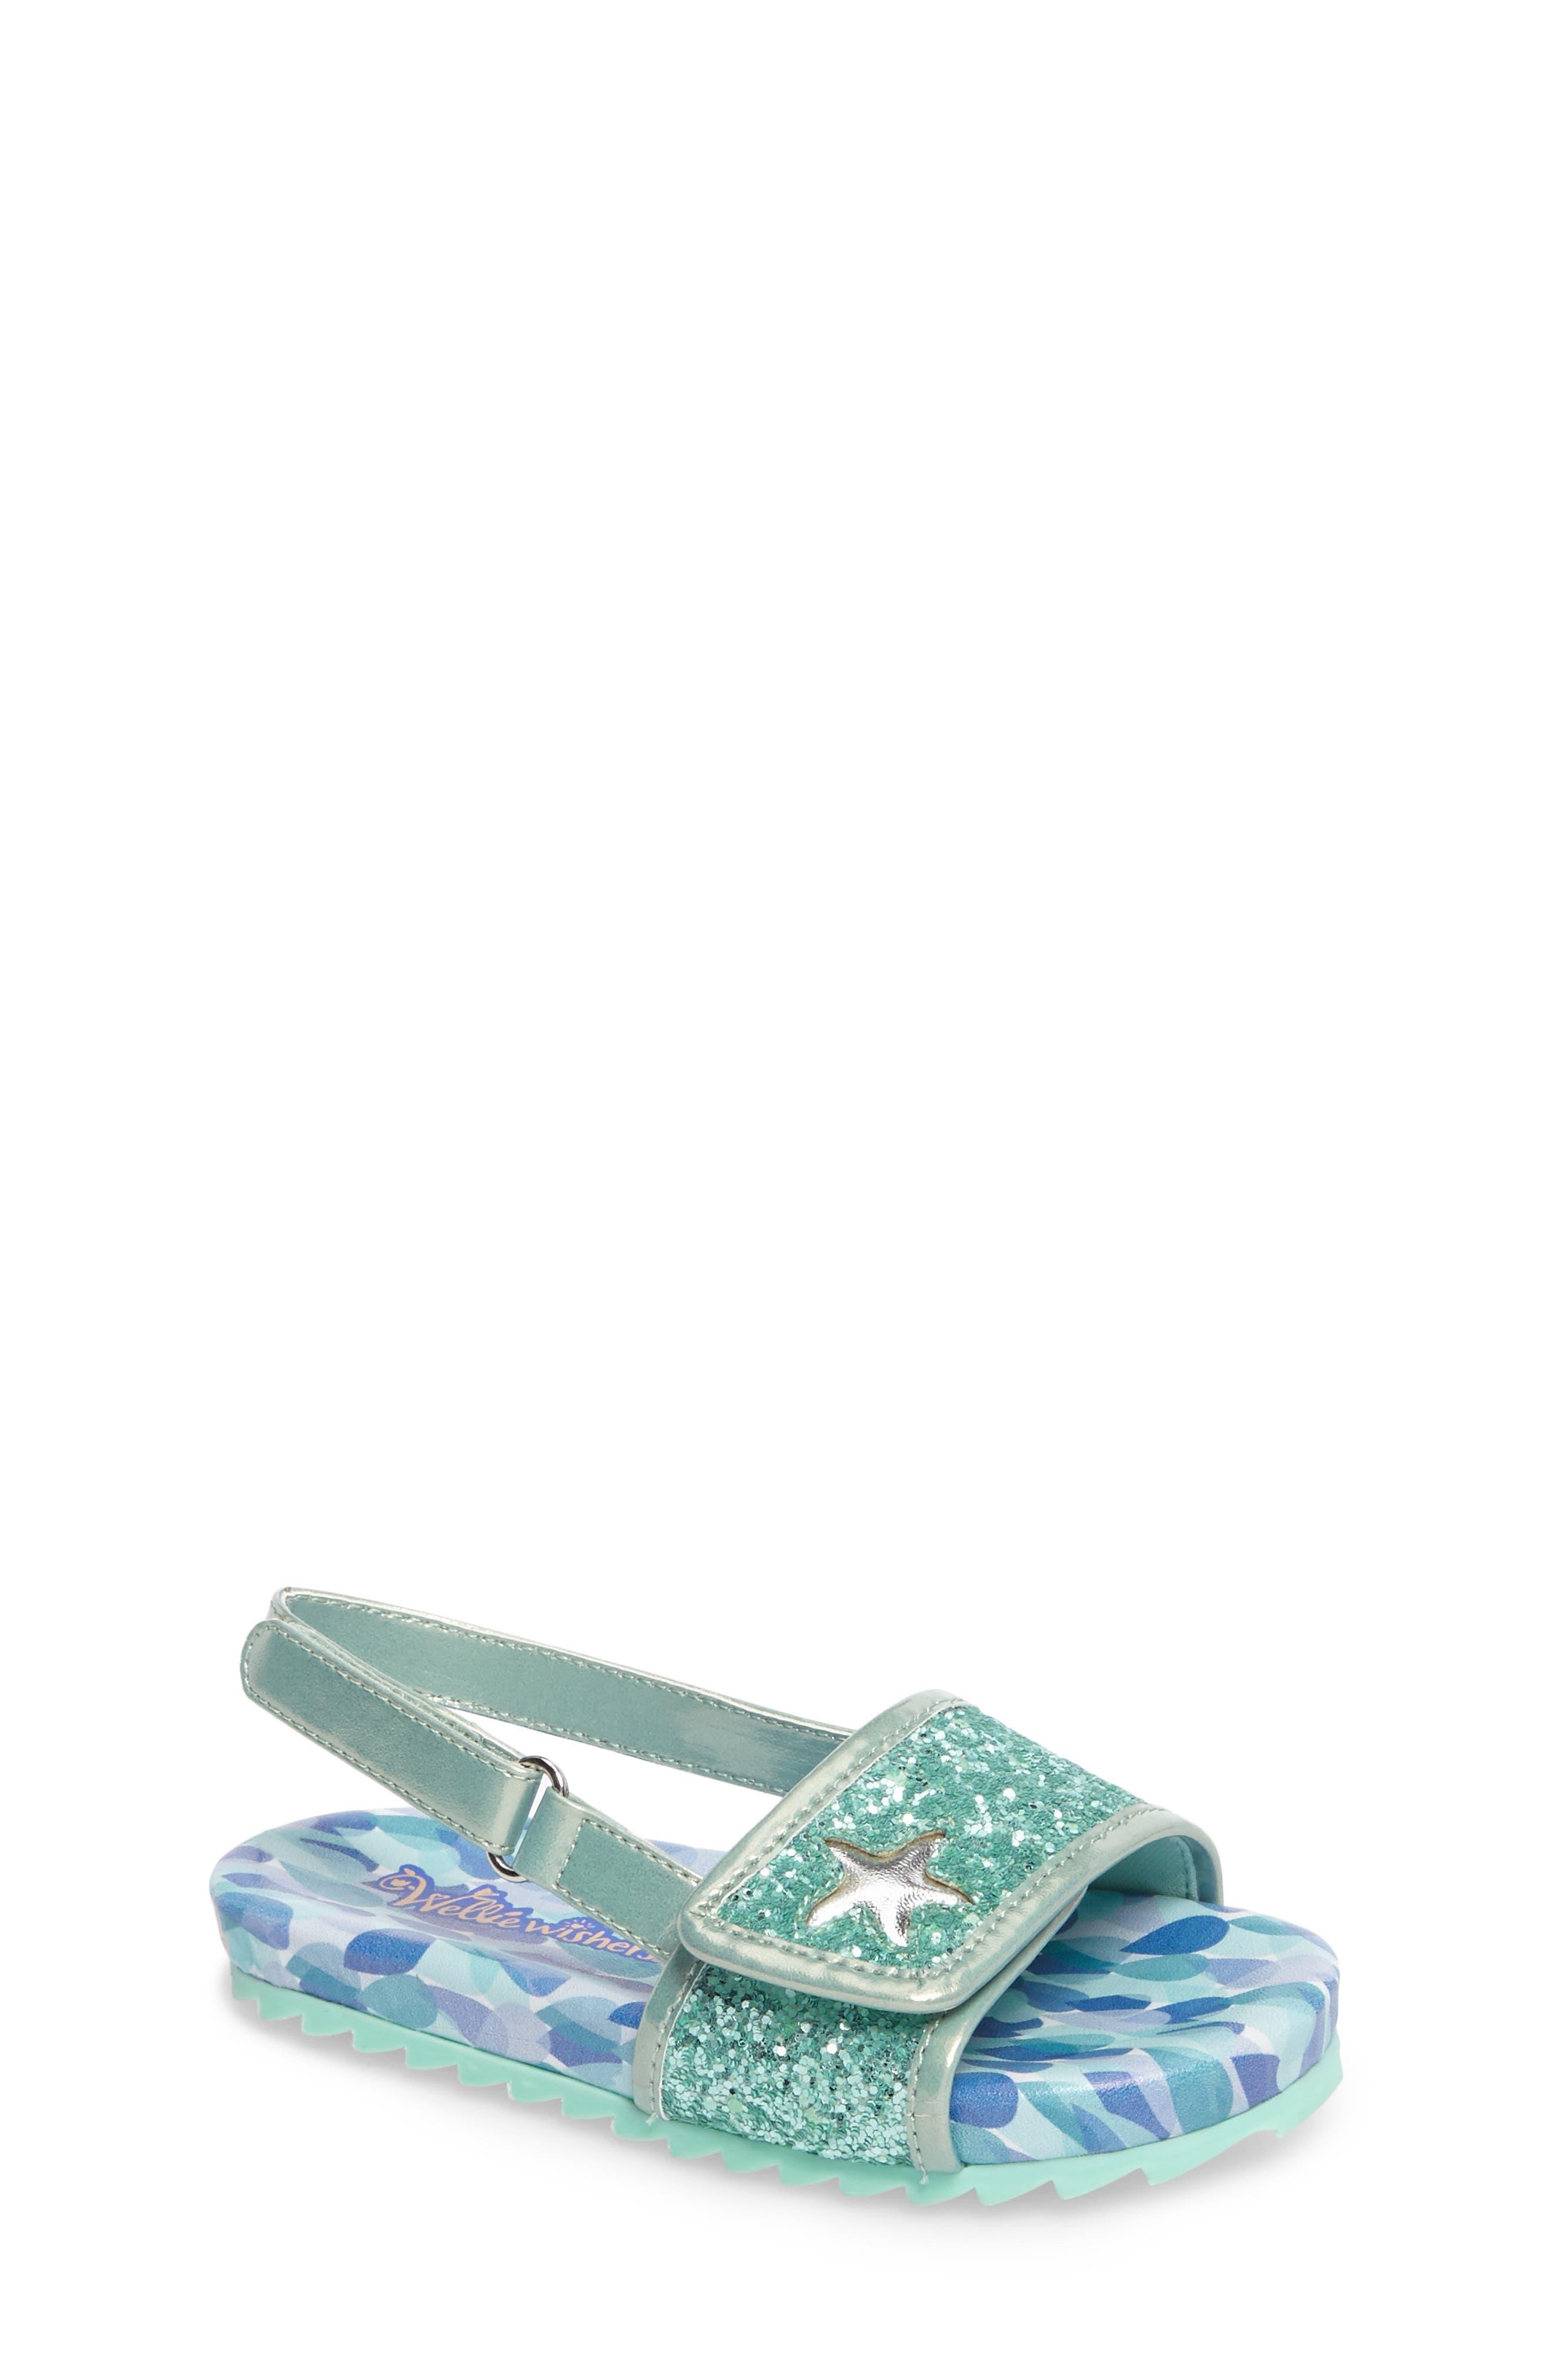 Camille Raindrop Strap Sandal,                             Main thumbnail 1, color,                             Glass Green